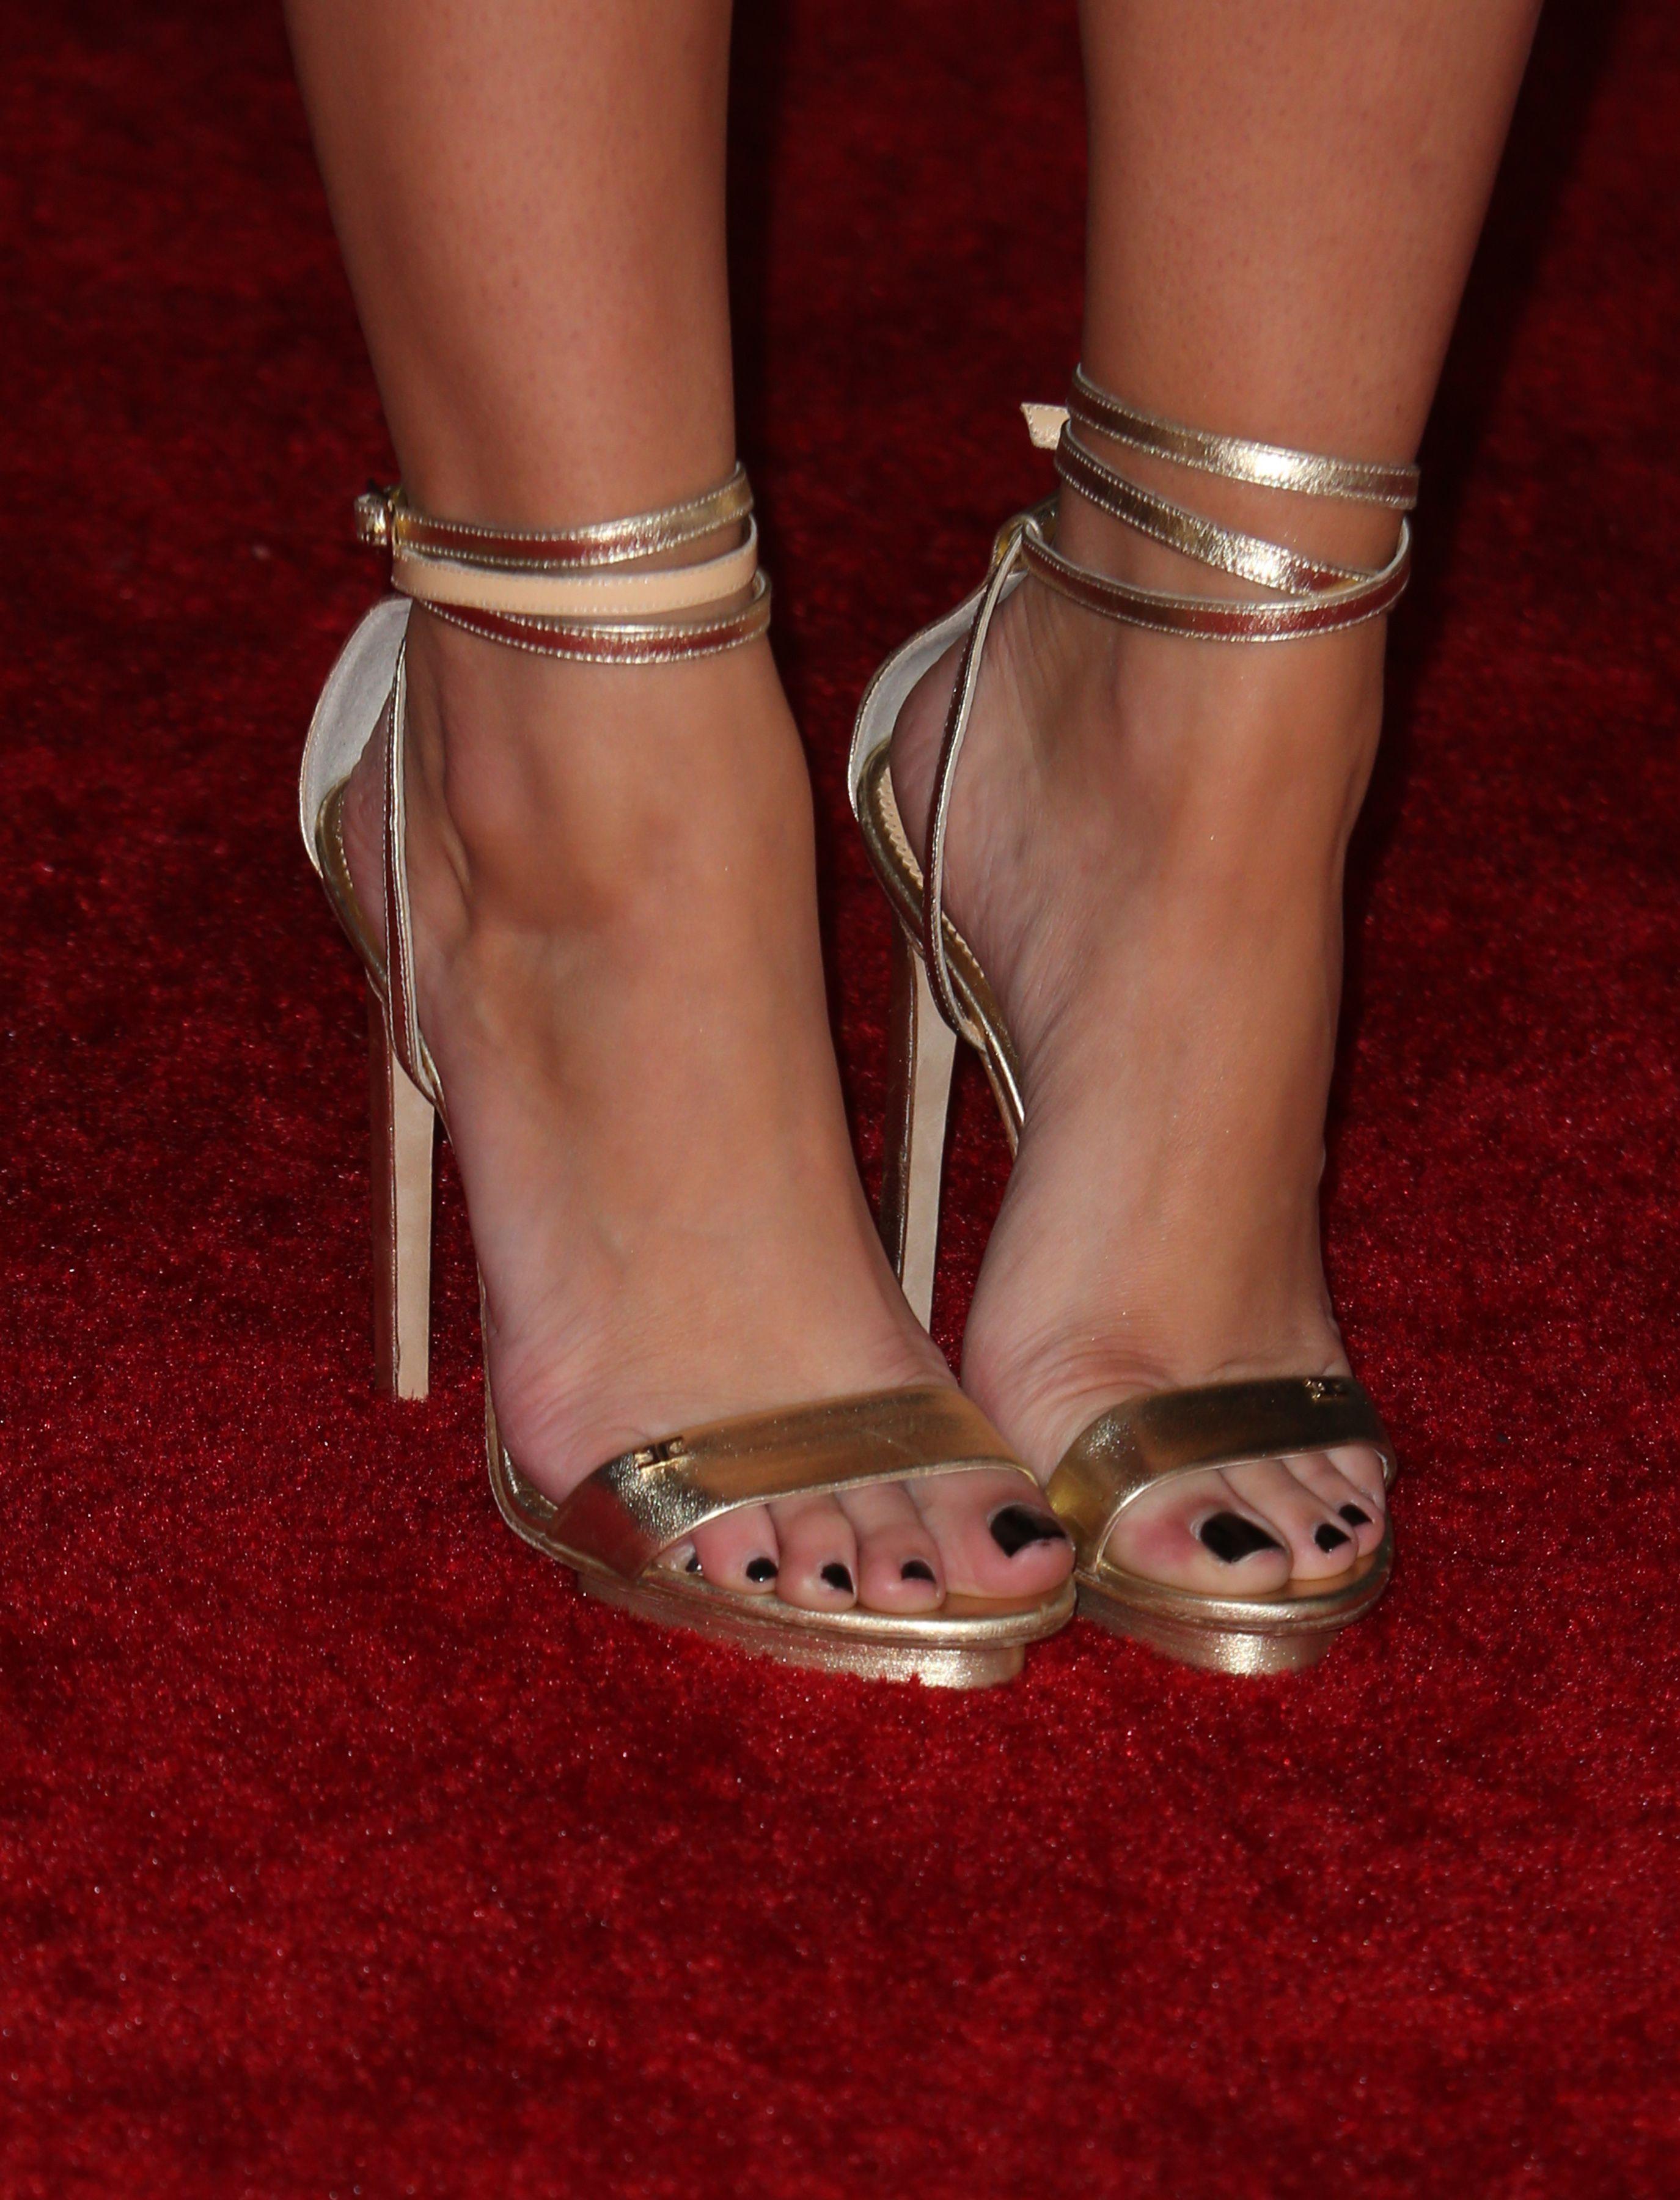 emily osment feet